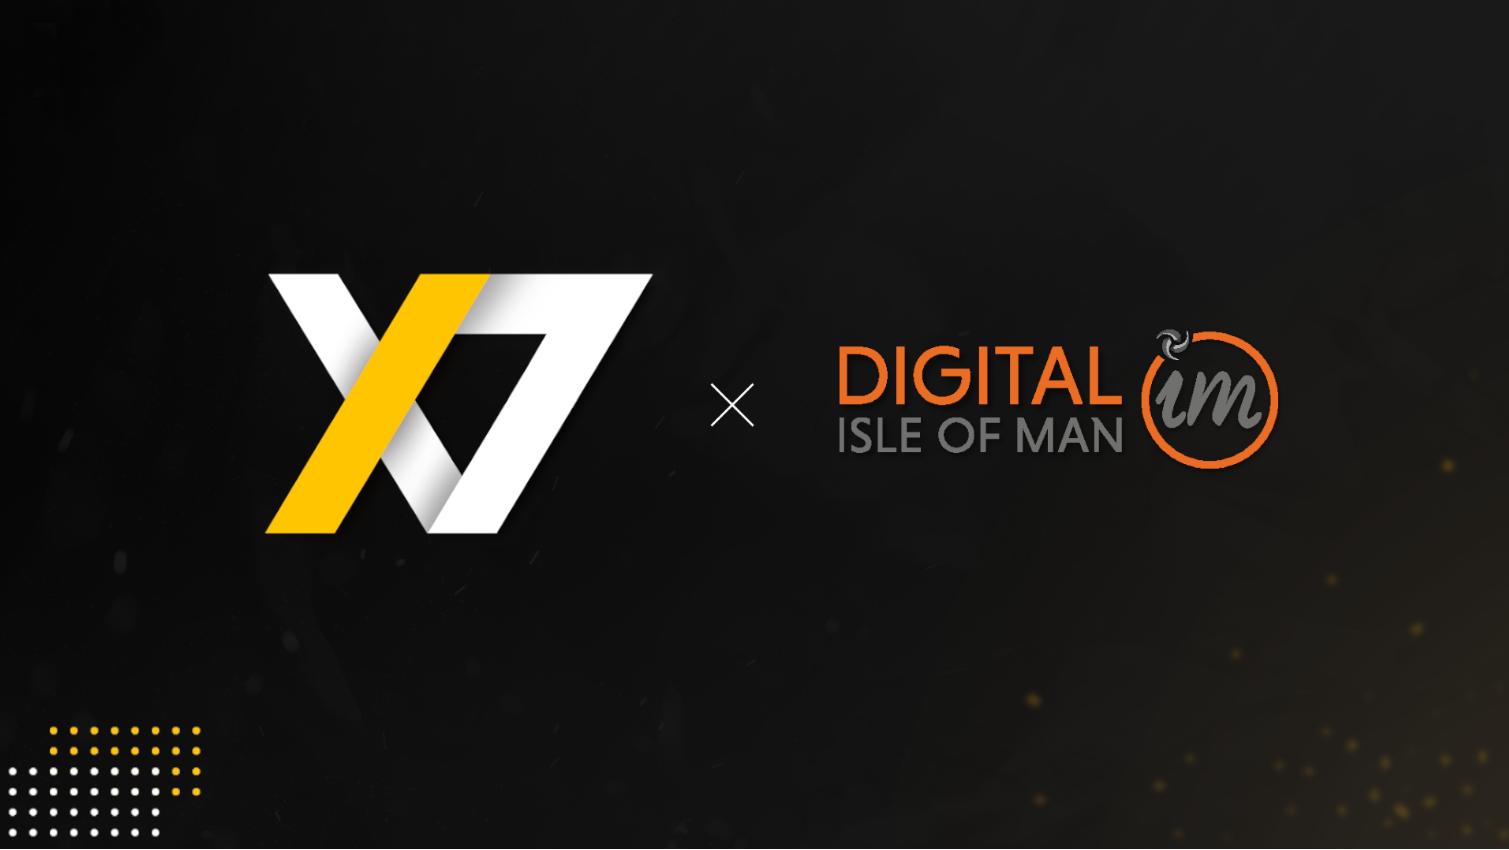 X7 Esports x Digital Isle of Man